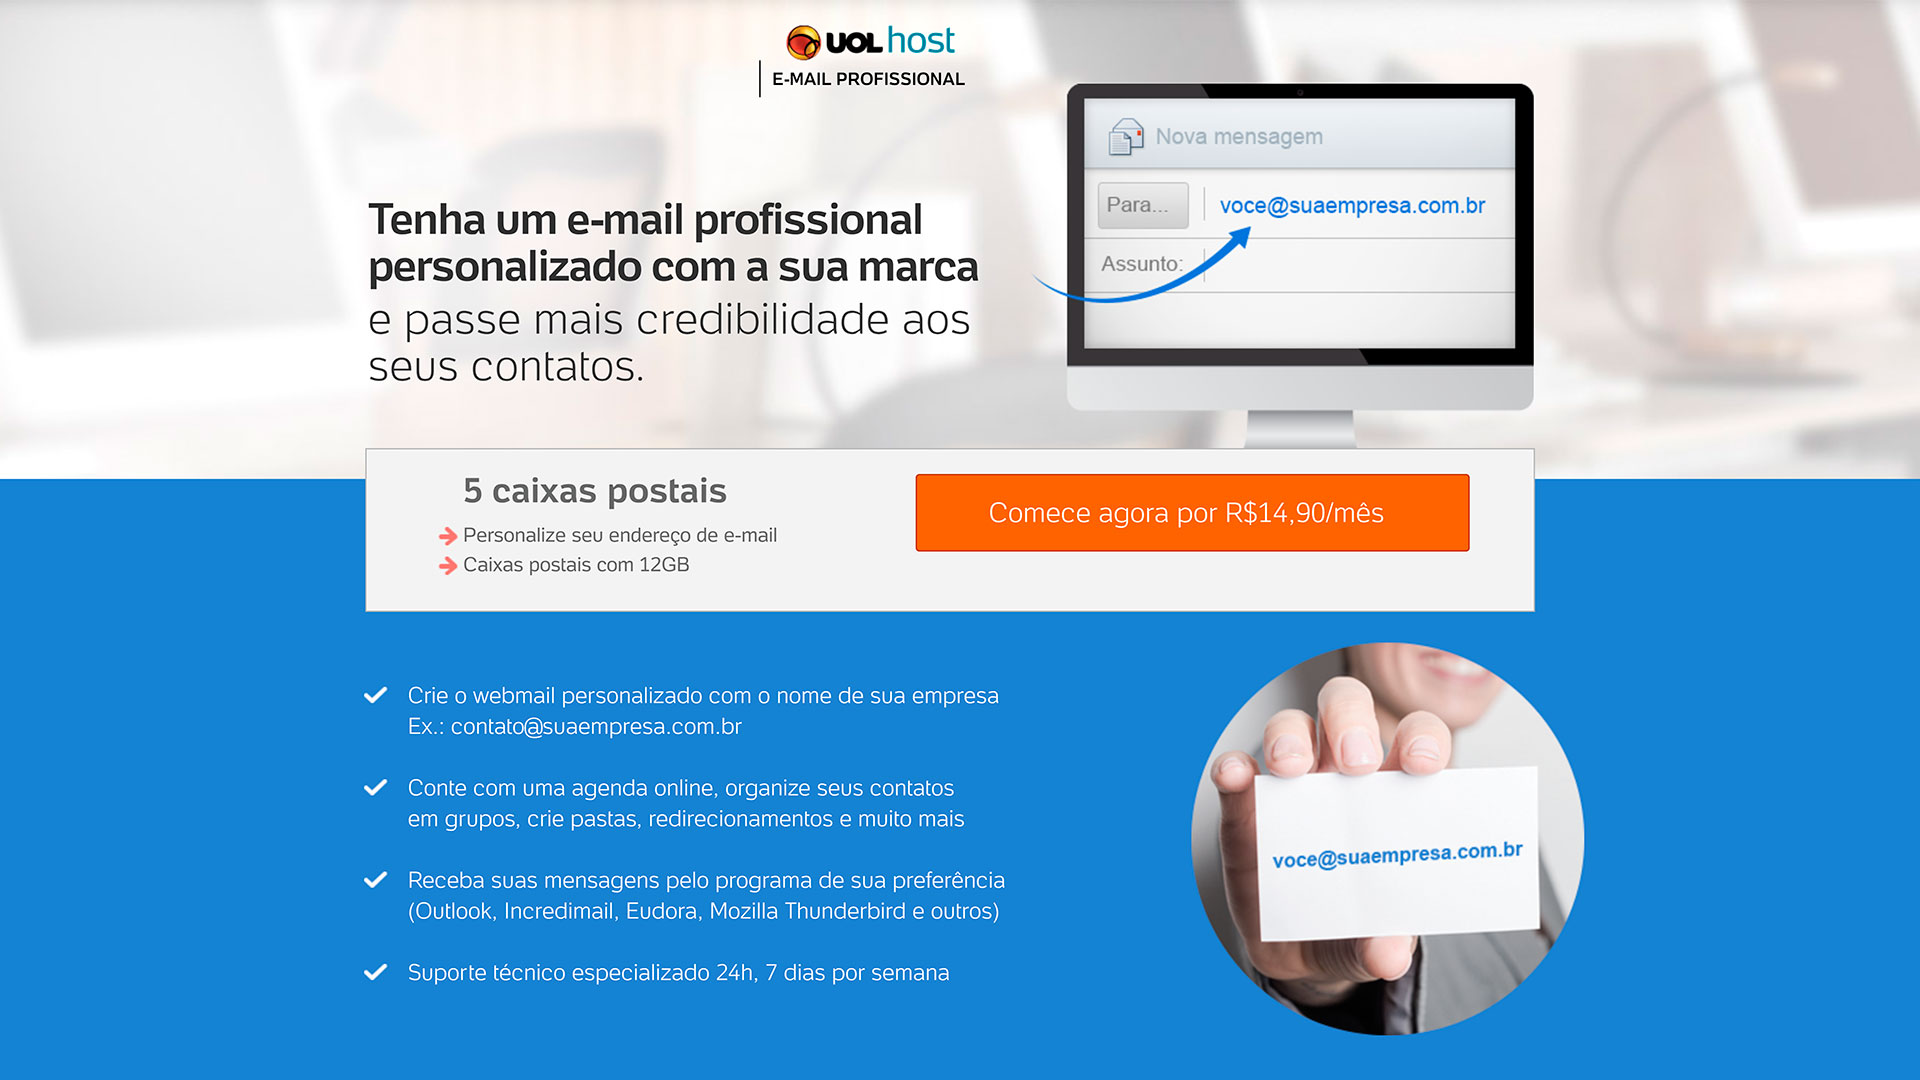 uol host e mail profissional